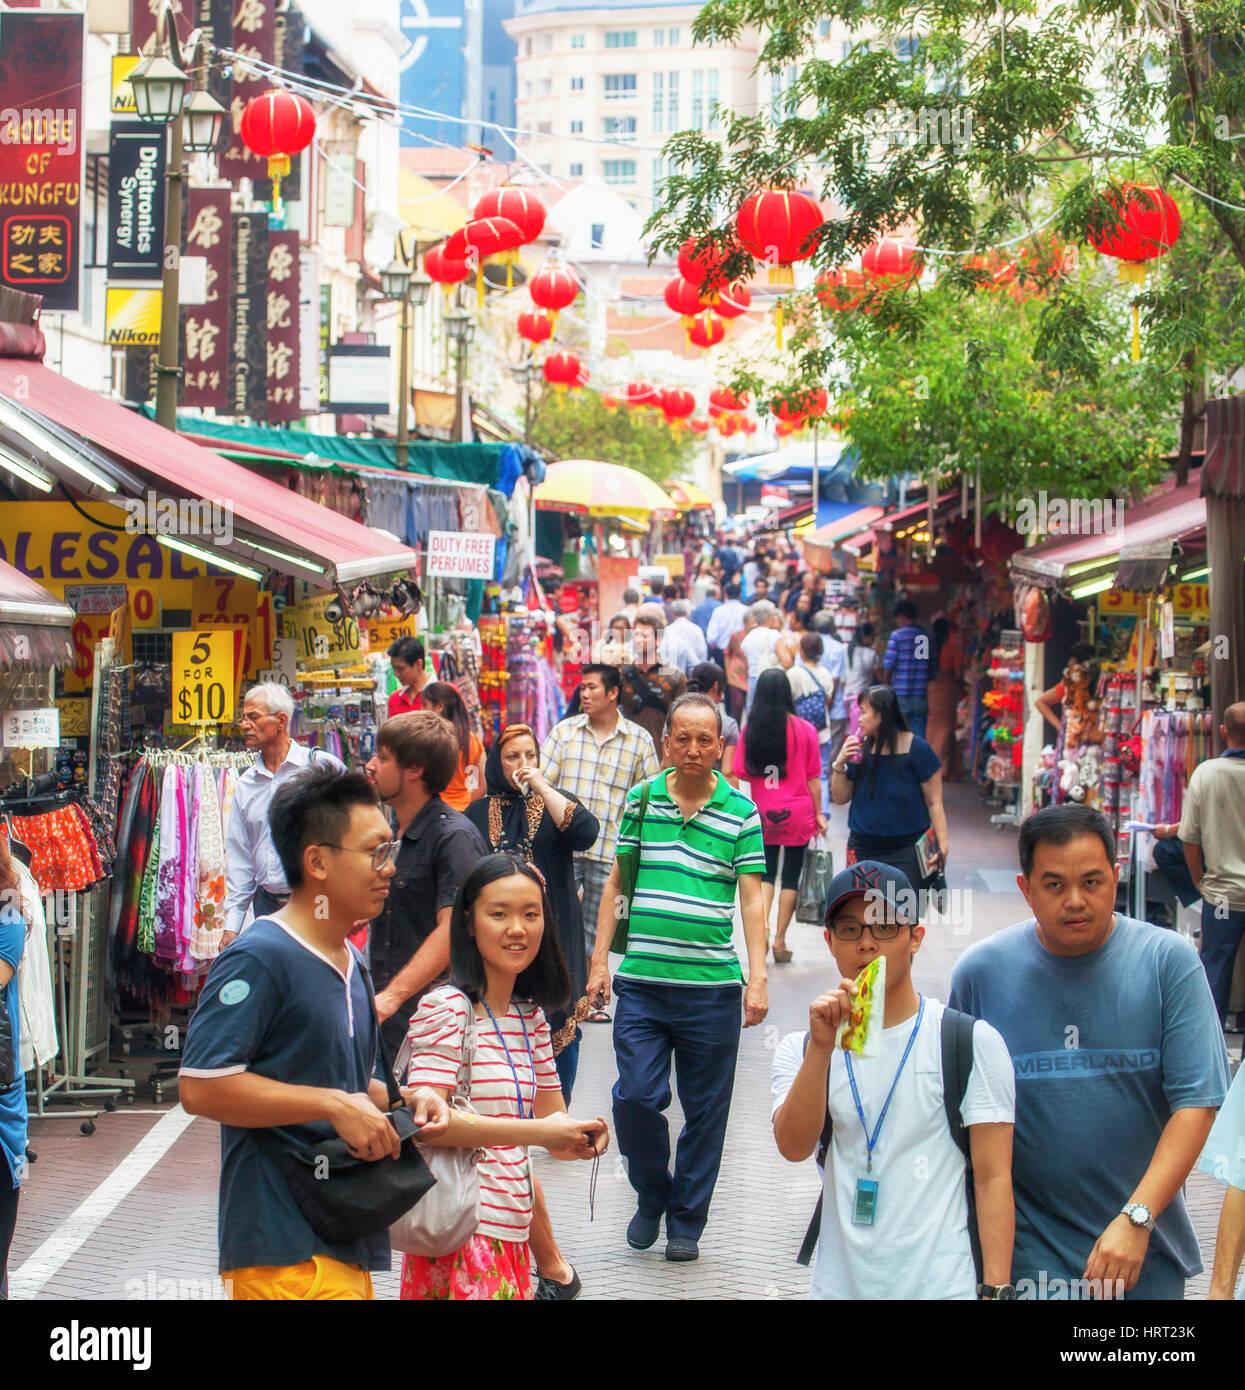 Pedestrianized street Pagoda, red Lampignons across the street, Singapore, Asia, Singapore - Stock Image